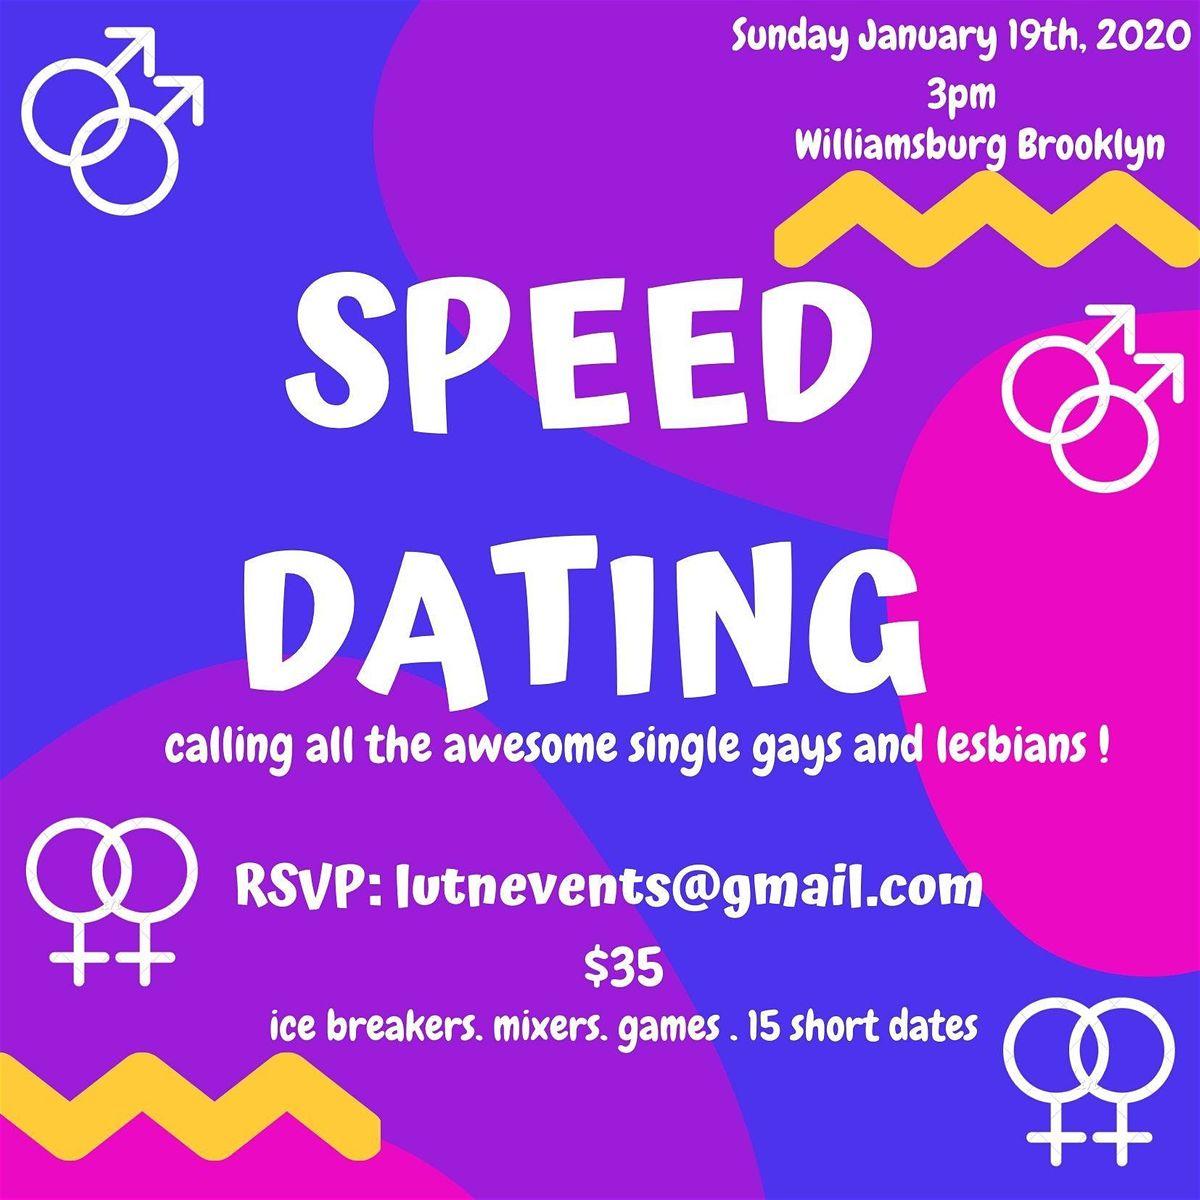 Speed dating williamsburg